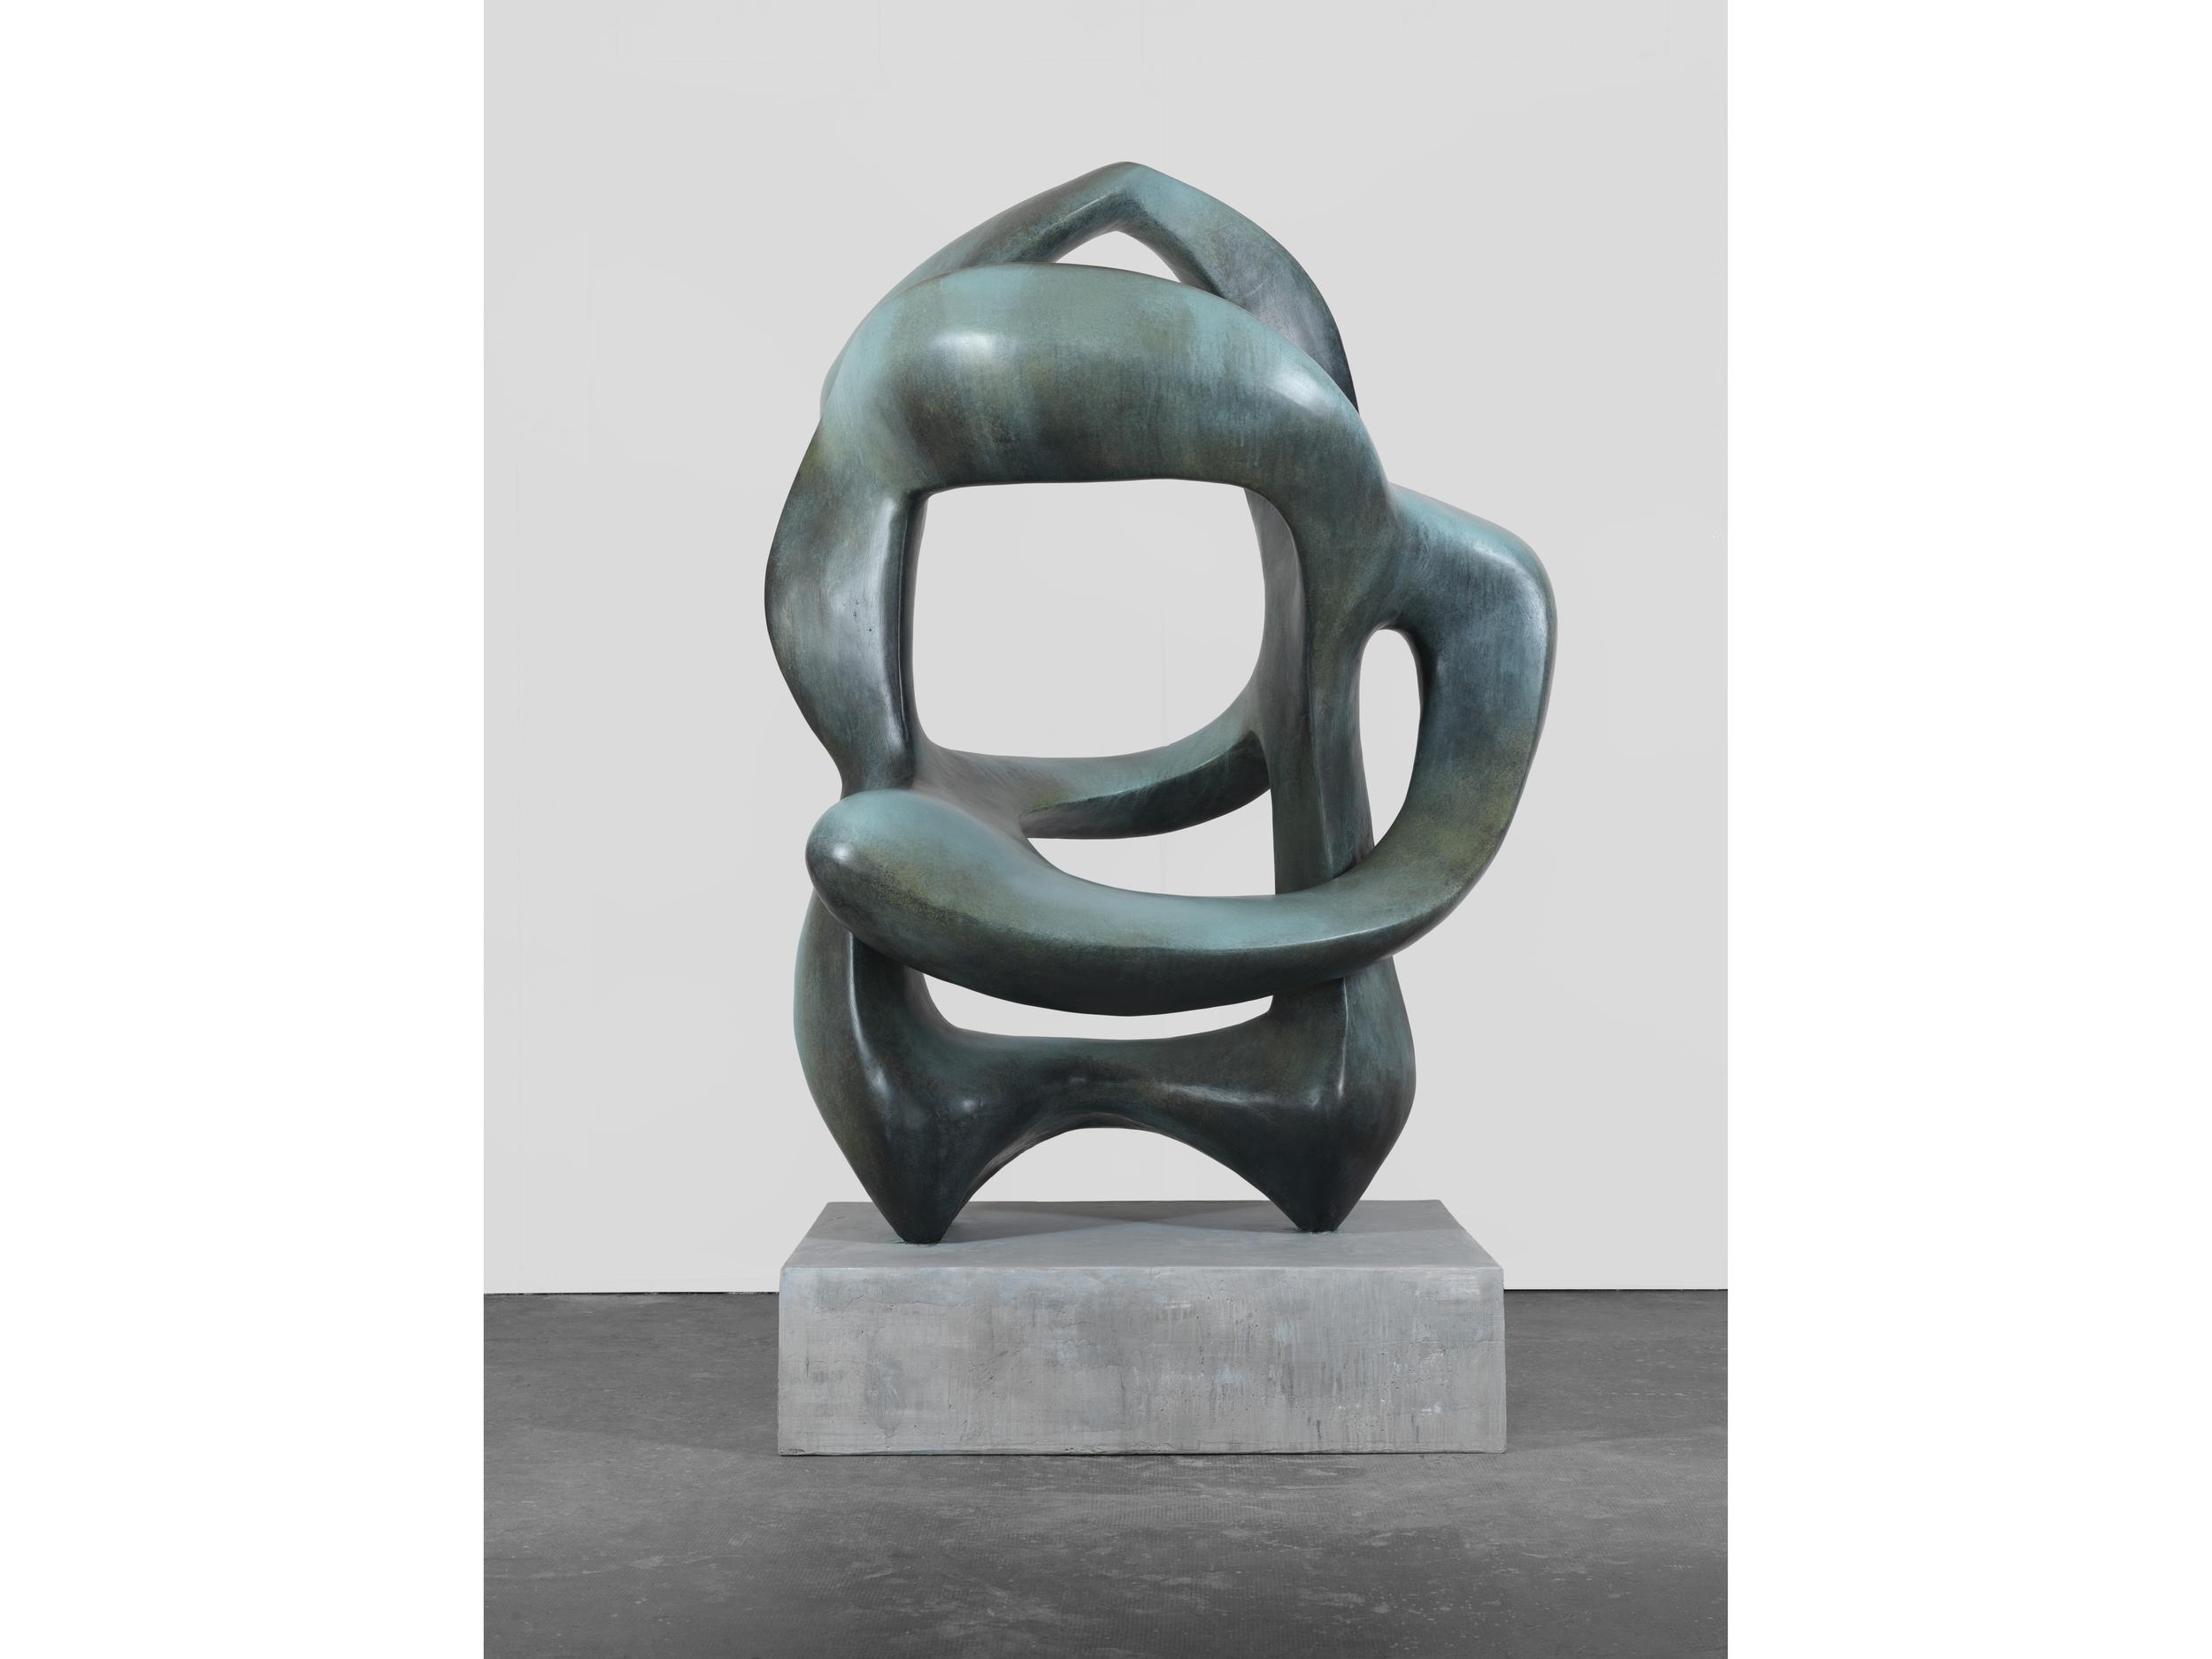 Galerie Eva Presenhuber | Valentin Carron | 2014